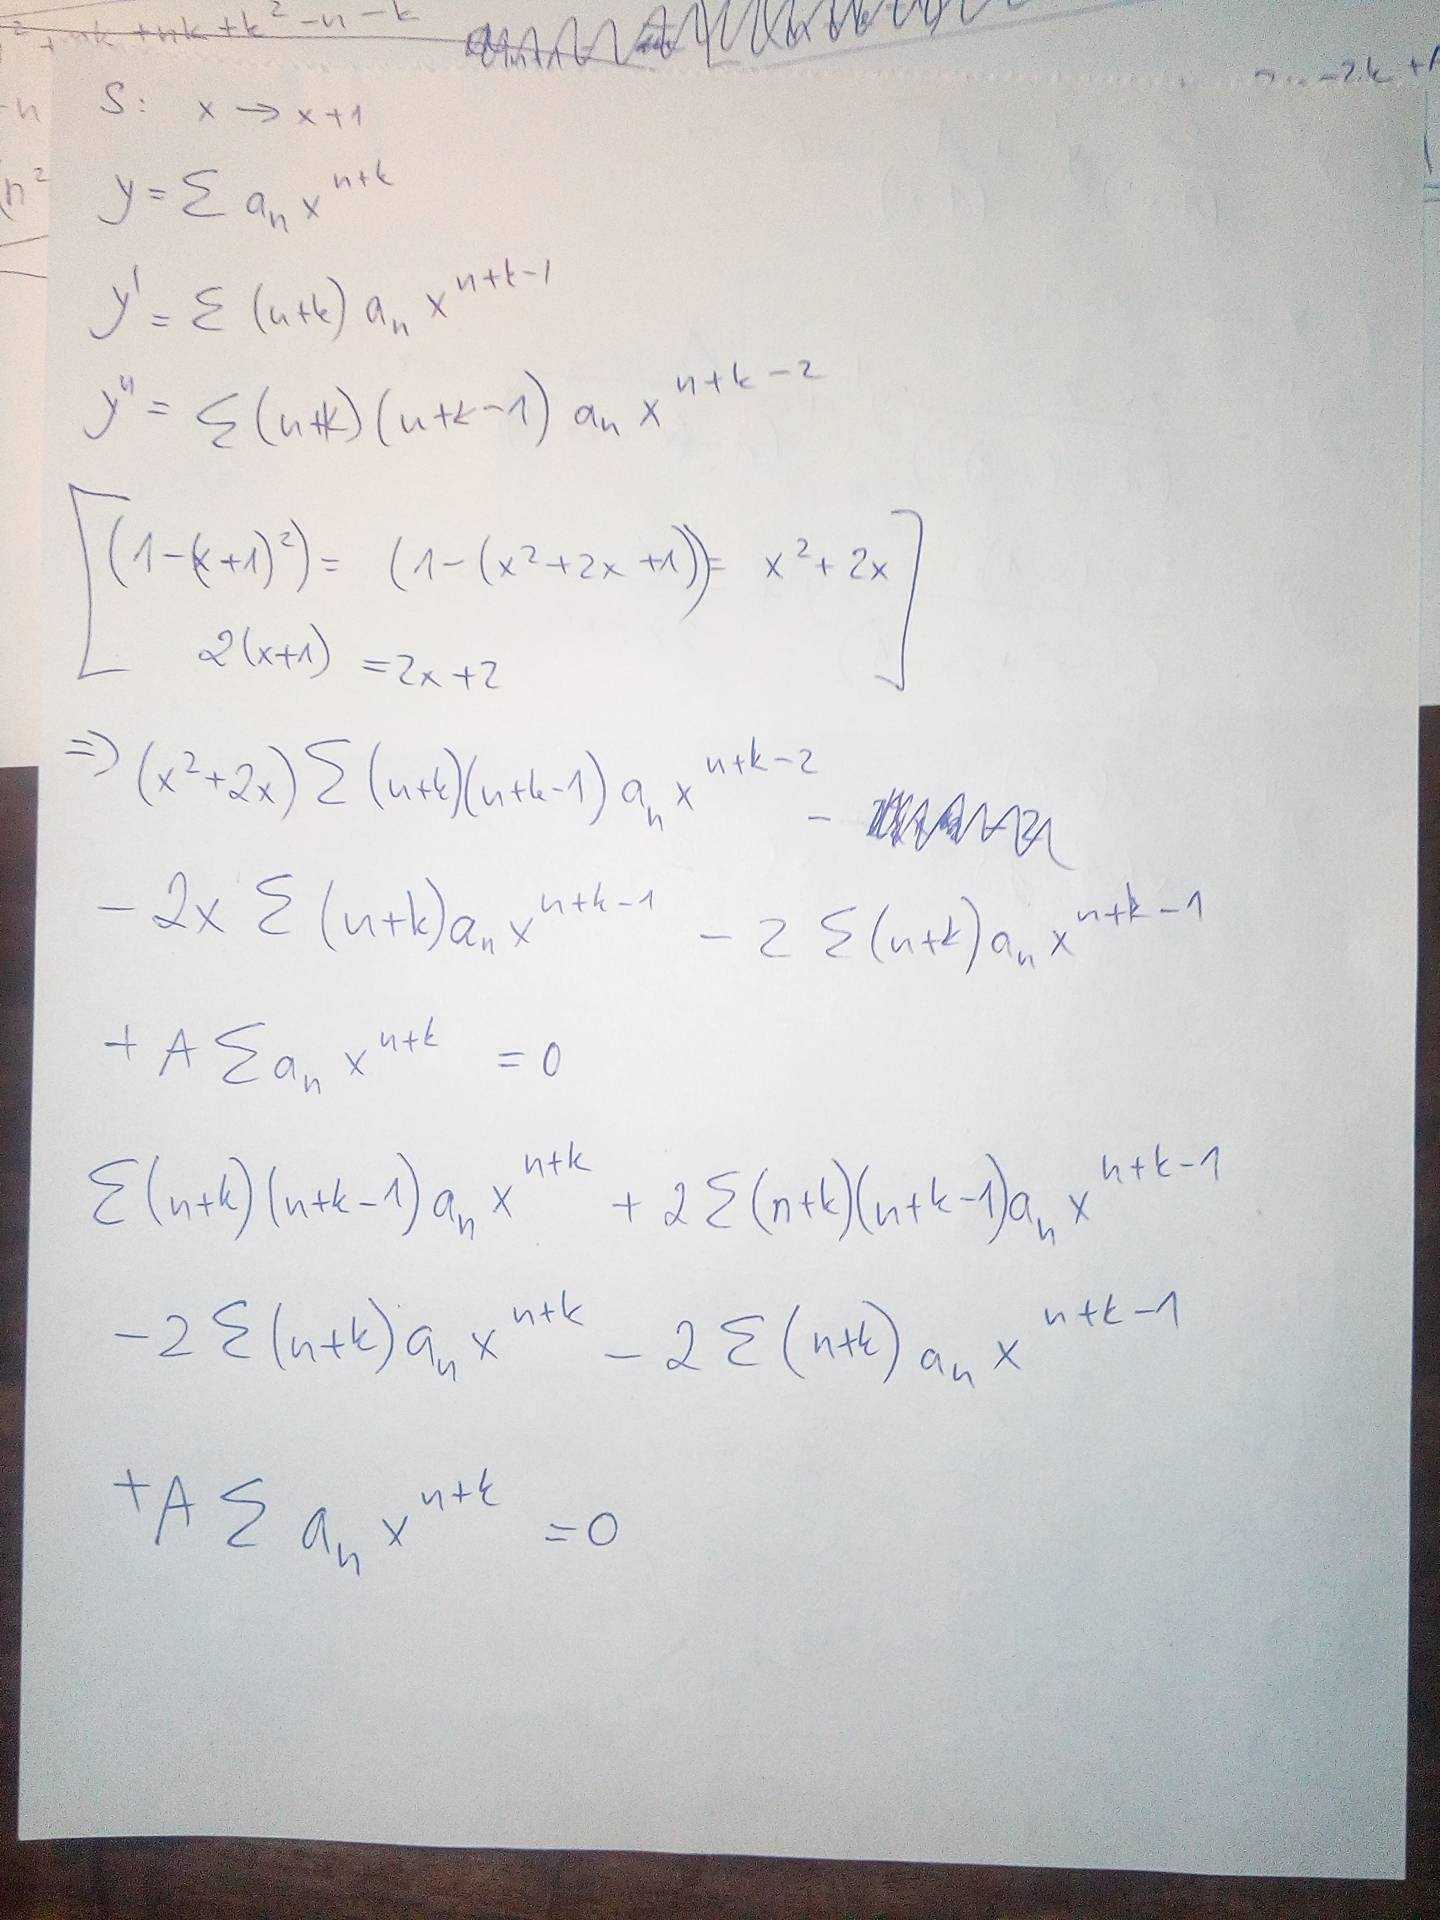 http://forum.matematika.cz/upload3/img/2017-08/88015_21124760_10203427216717627_1534422026_o.jpg